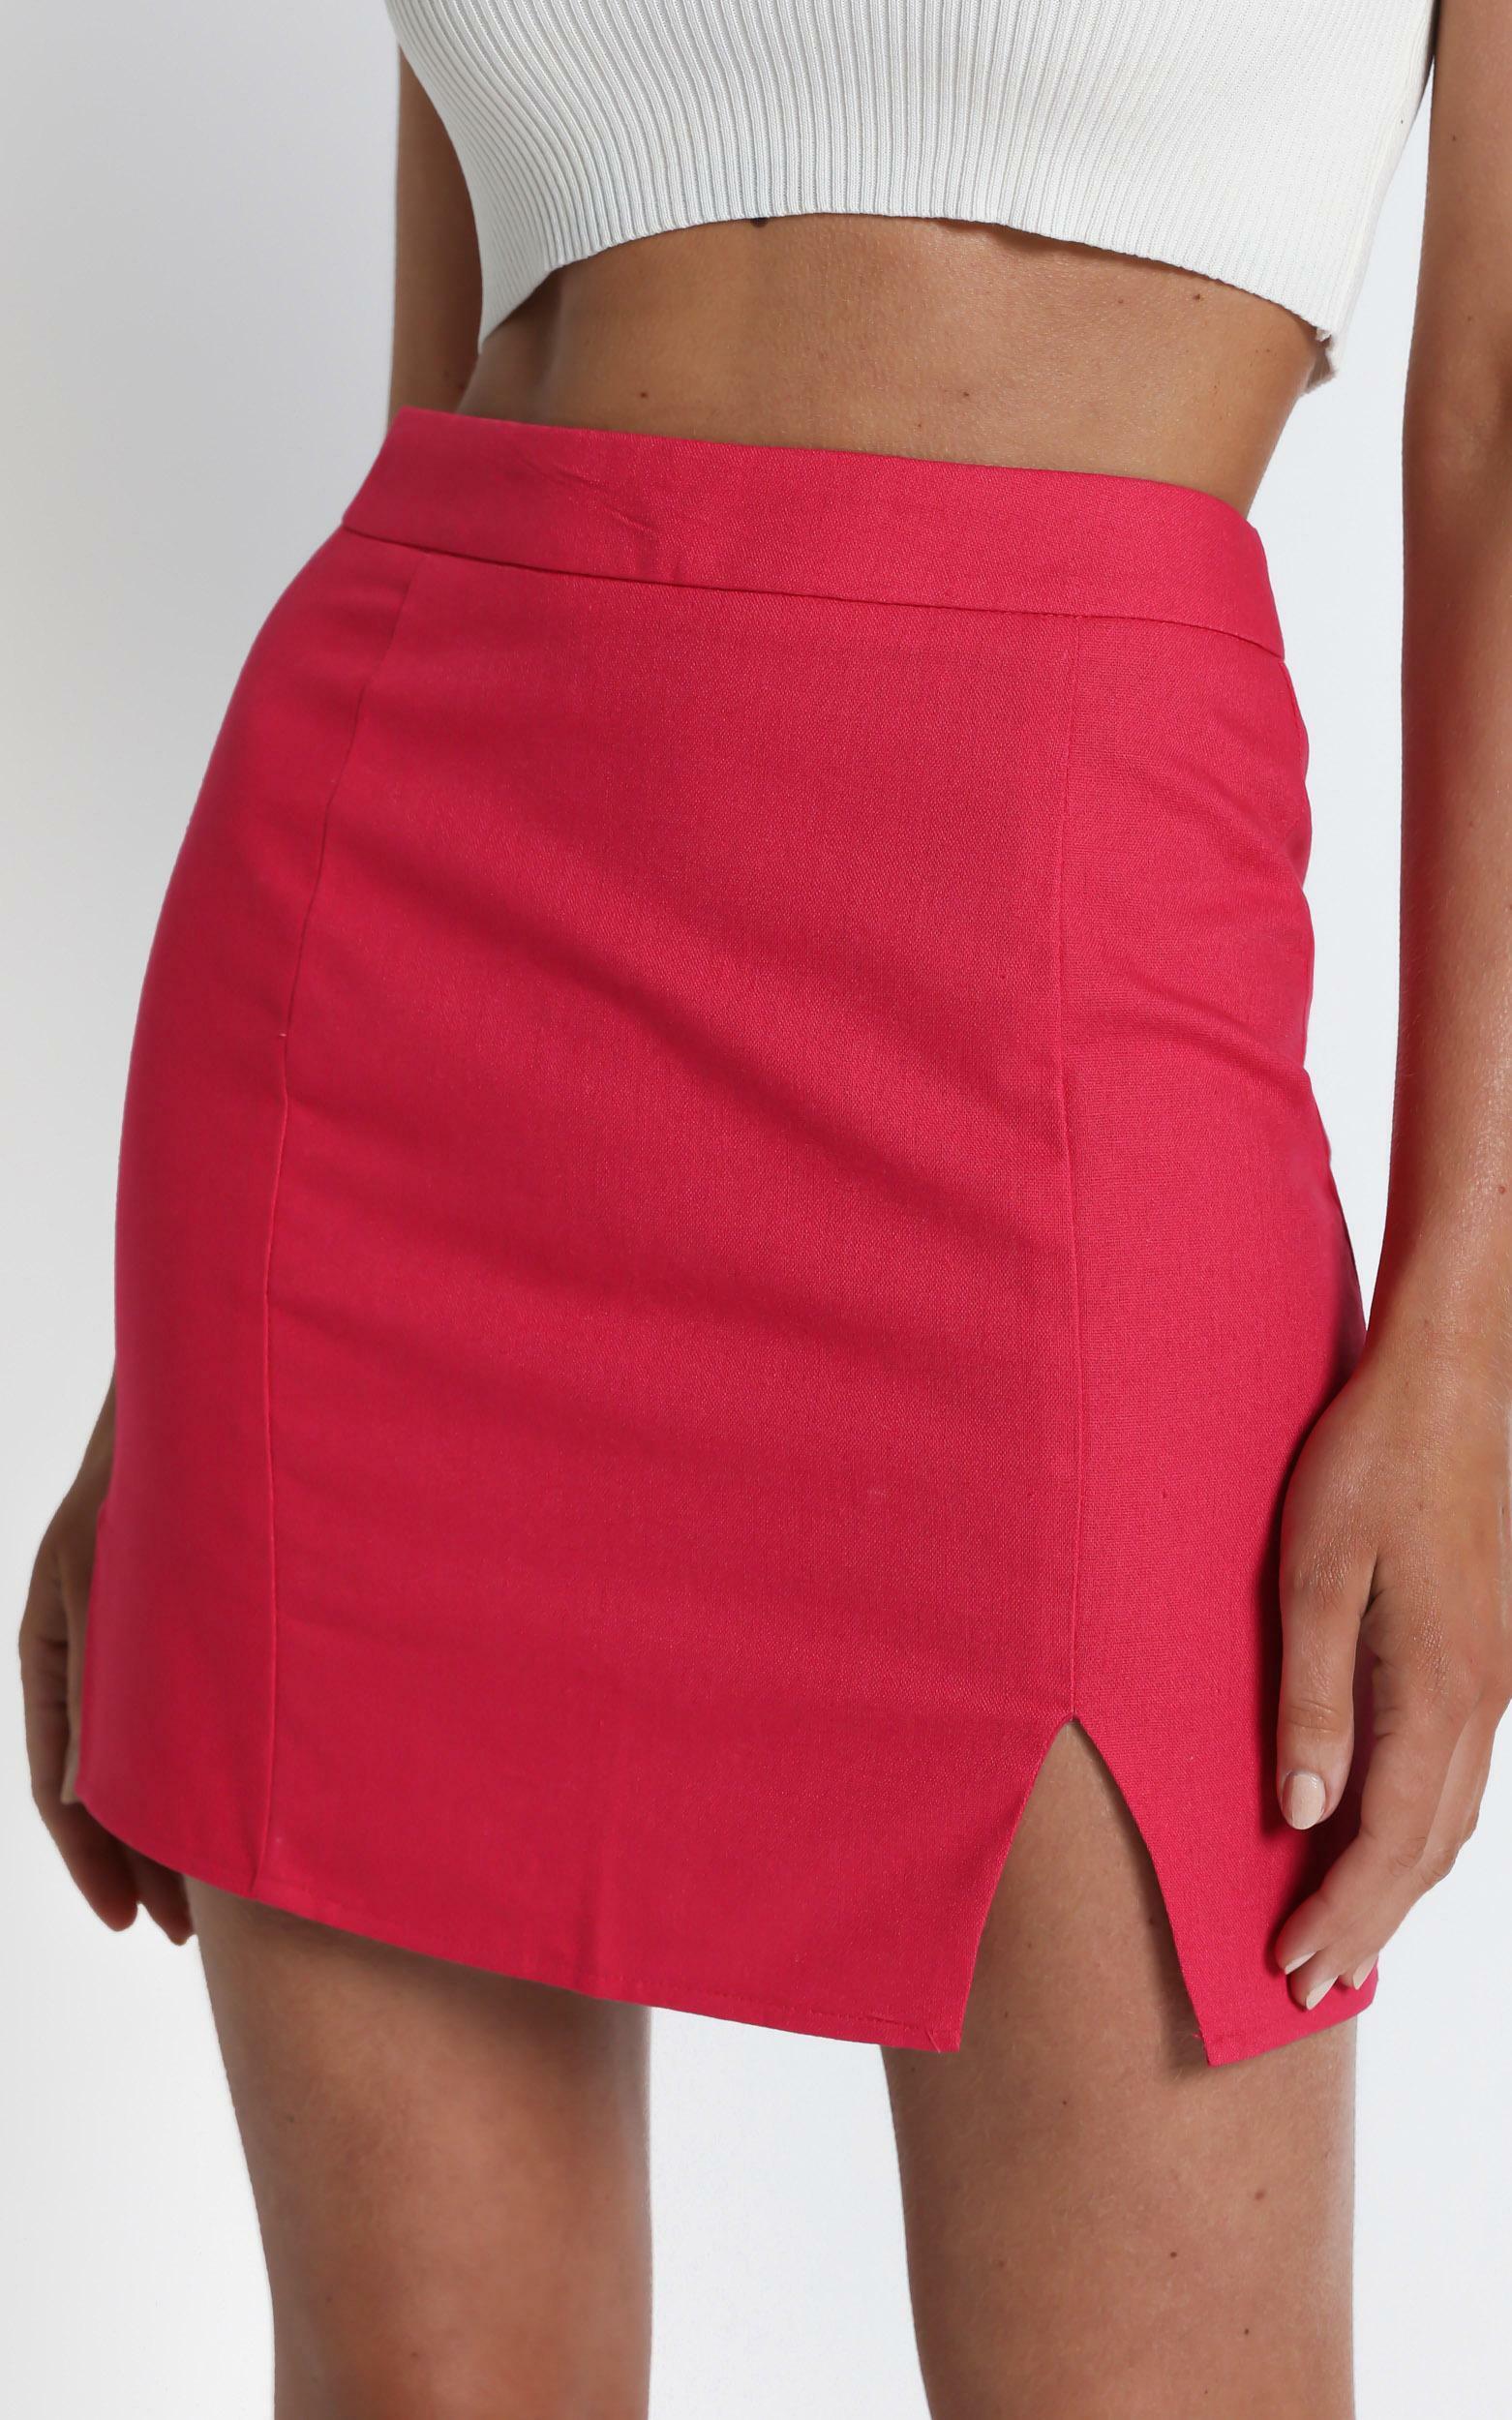 International Babe Skirt in Hot Pink Linen Look - 04, PNK5, hi-res image number null